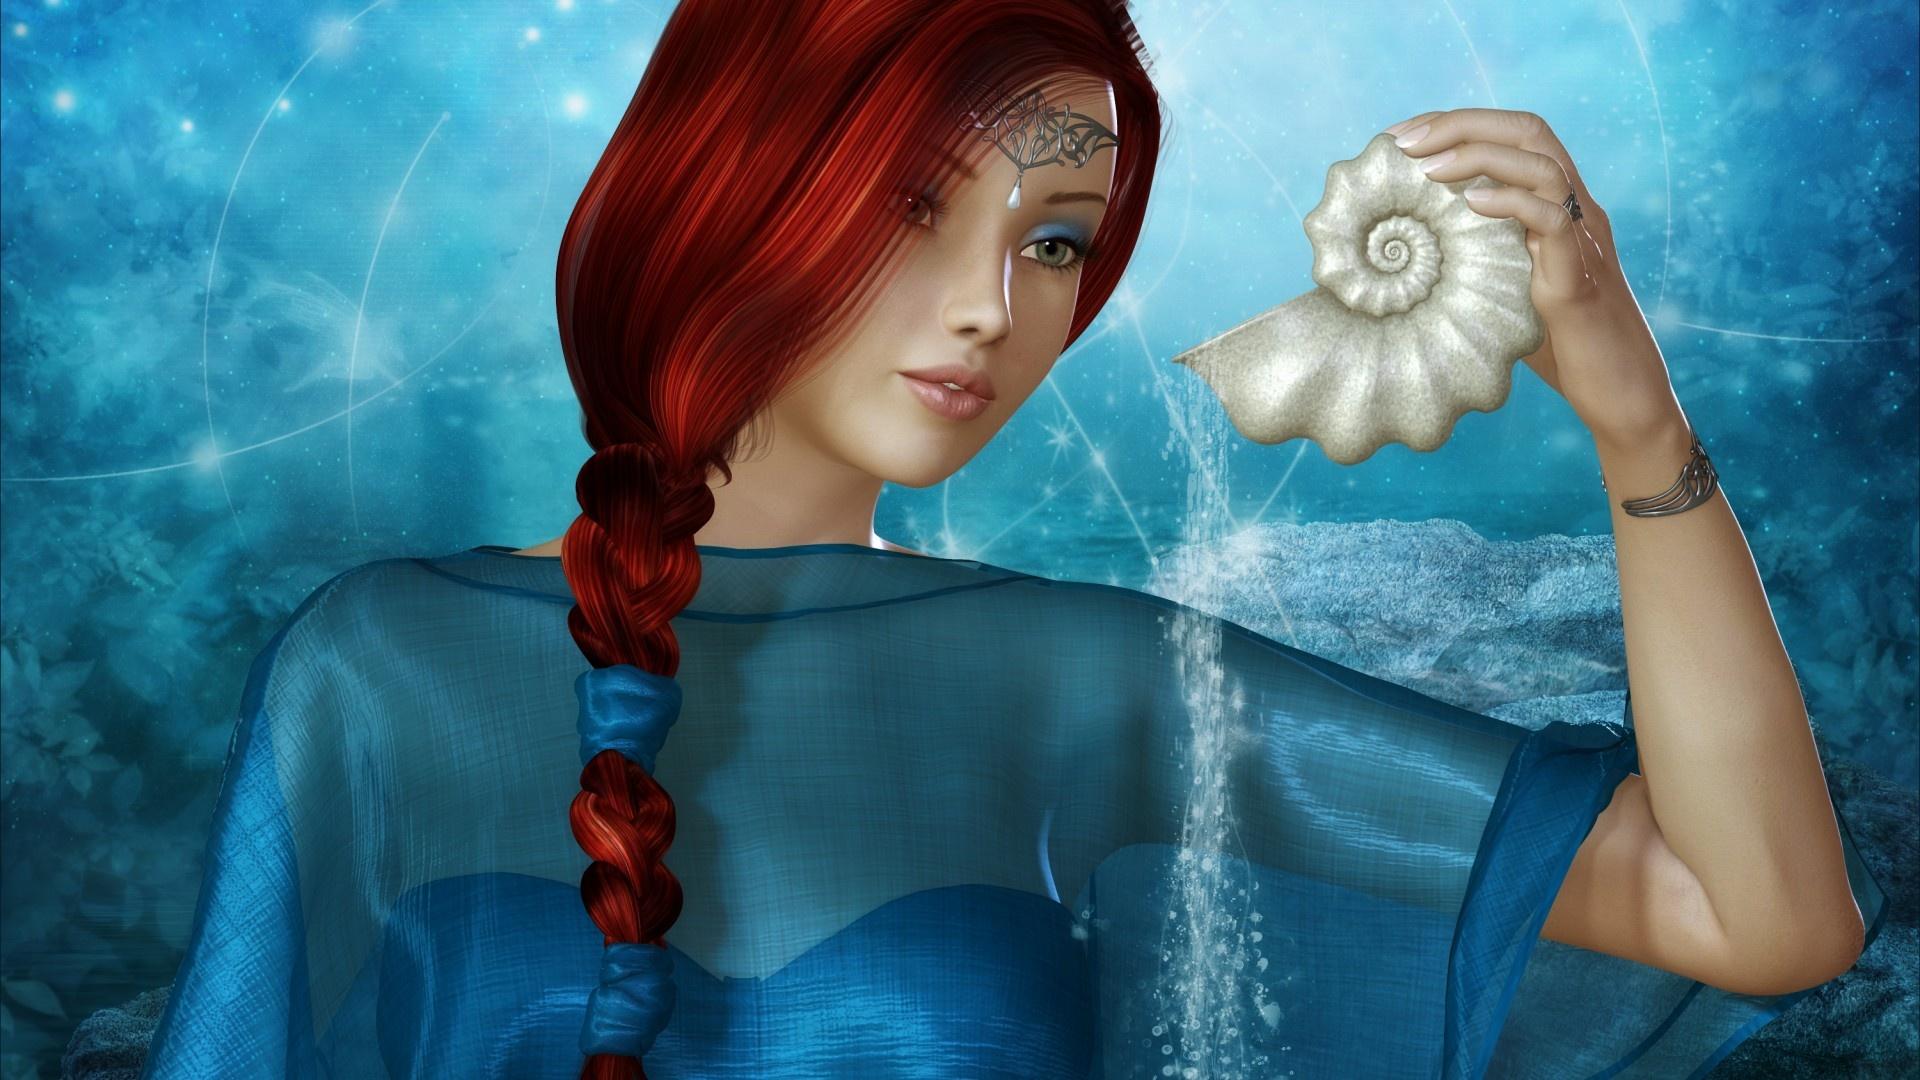 glitter water girl wallpaper shell magic goodwp anime fantasy 1920x1080